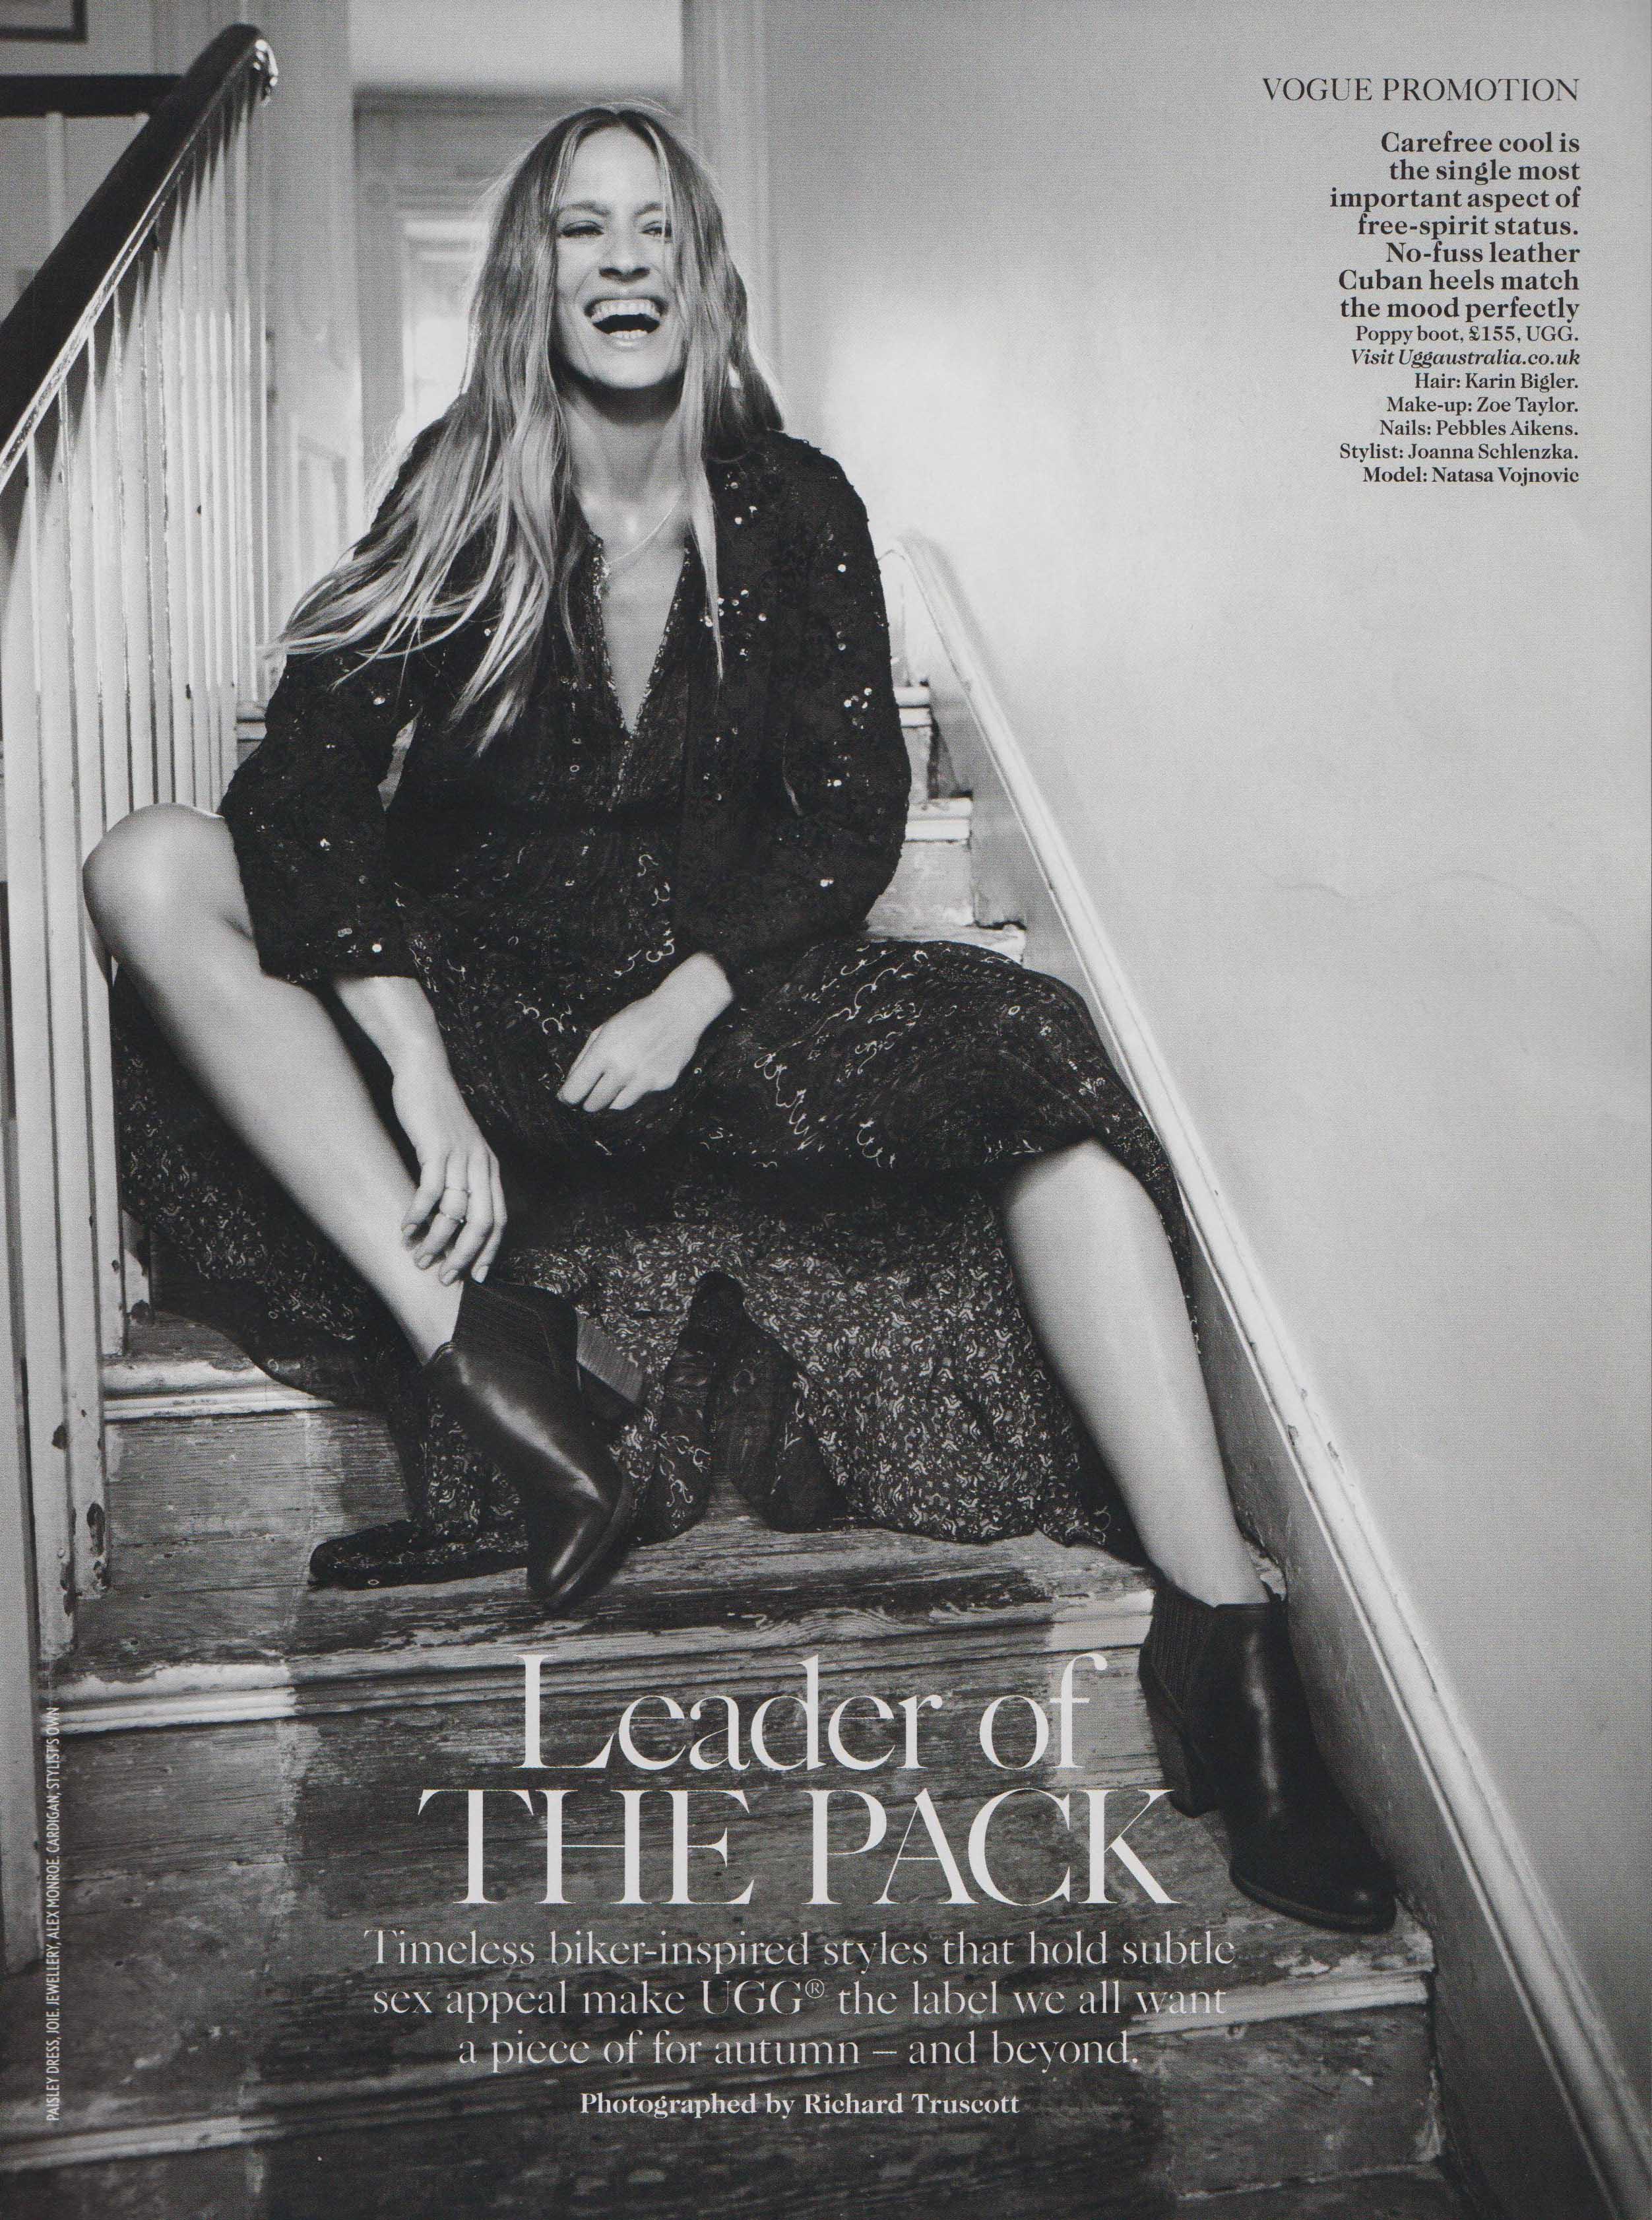 NATASA VOJNOVIC Vogue UK by Richard Truscott and Joanna Schlenzka